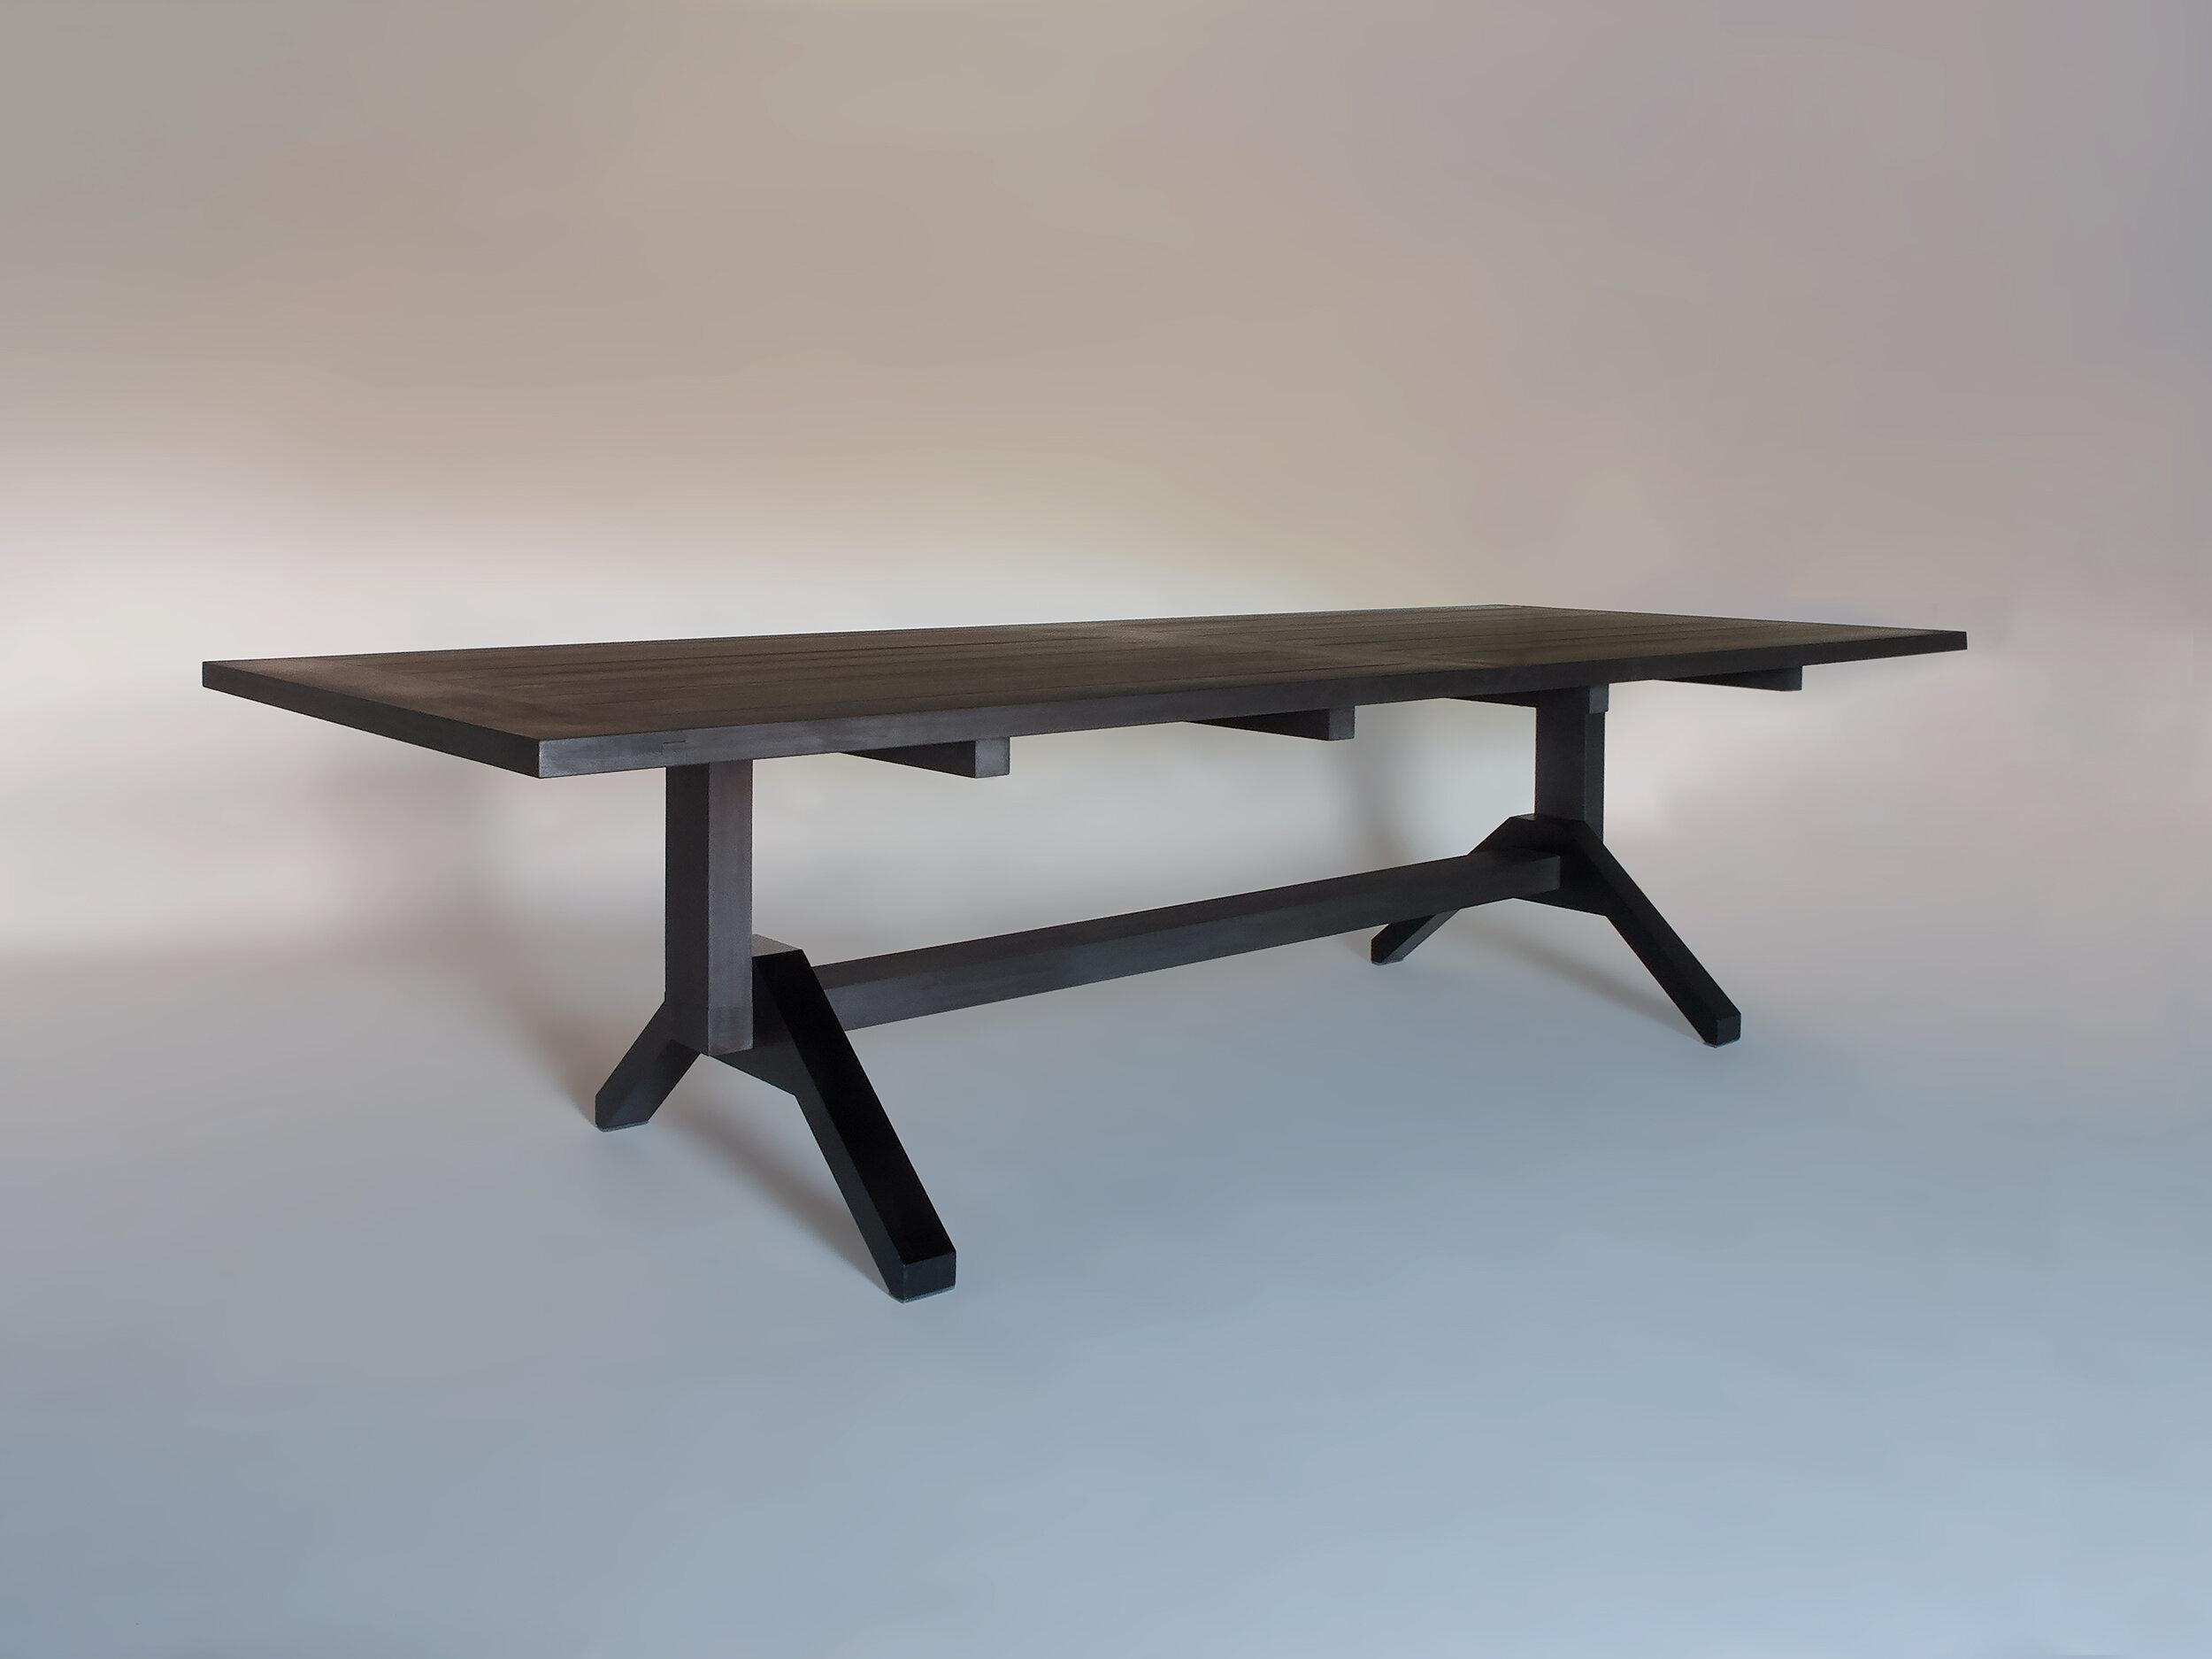 "Sapele, oxidized & charcoal oil finish Black urethane coated steel 108""L x 42""W x 29""H"